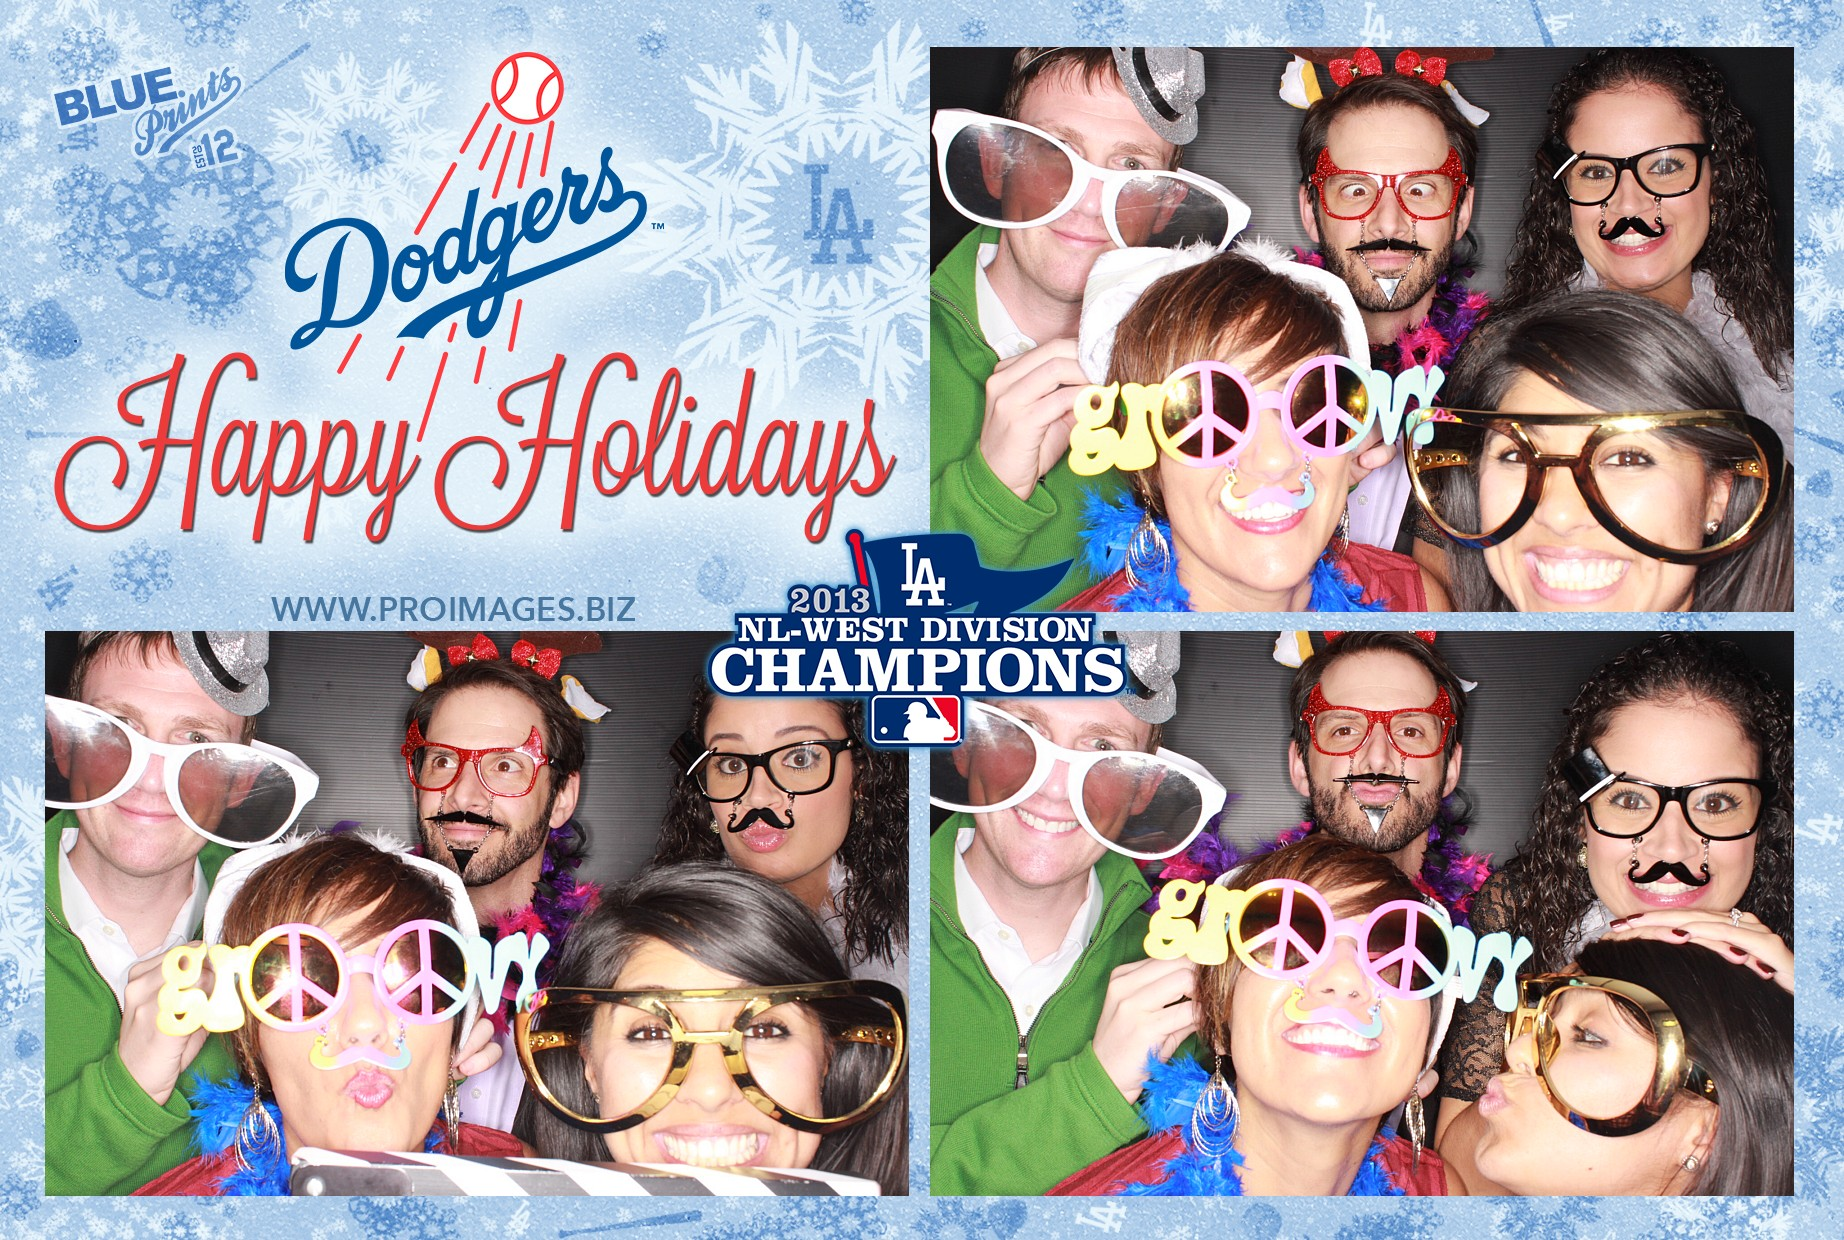 Dodgers_Holidays.jpg